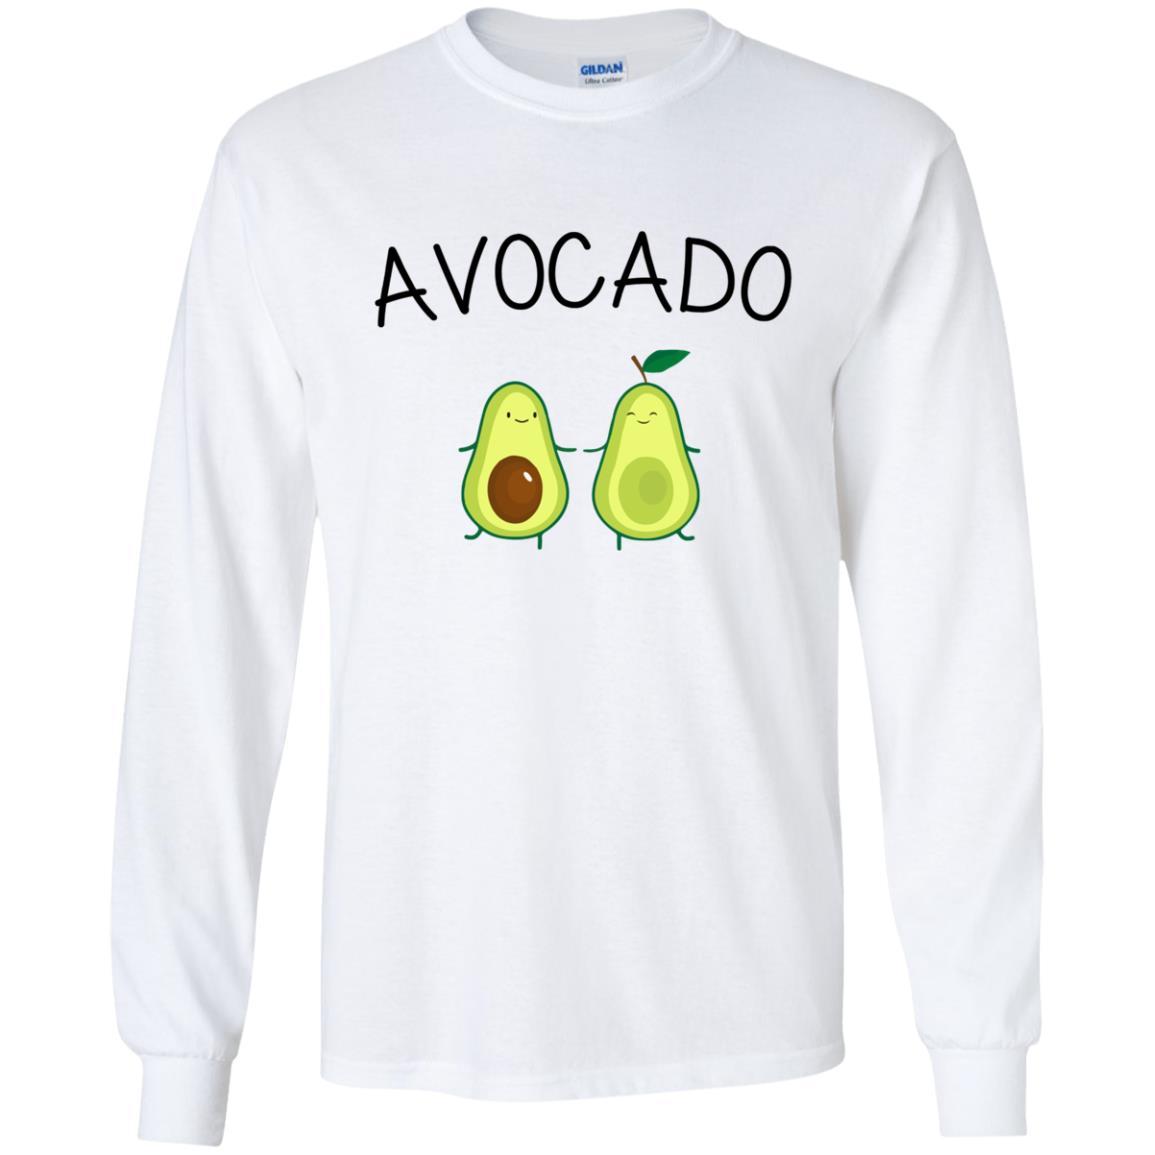 image 16 - Vegan Avocado Shirt, Sweater, Hoodie